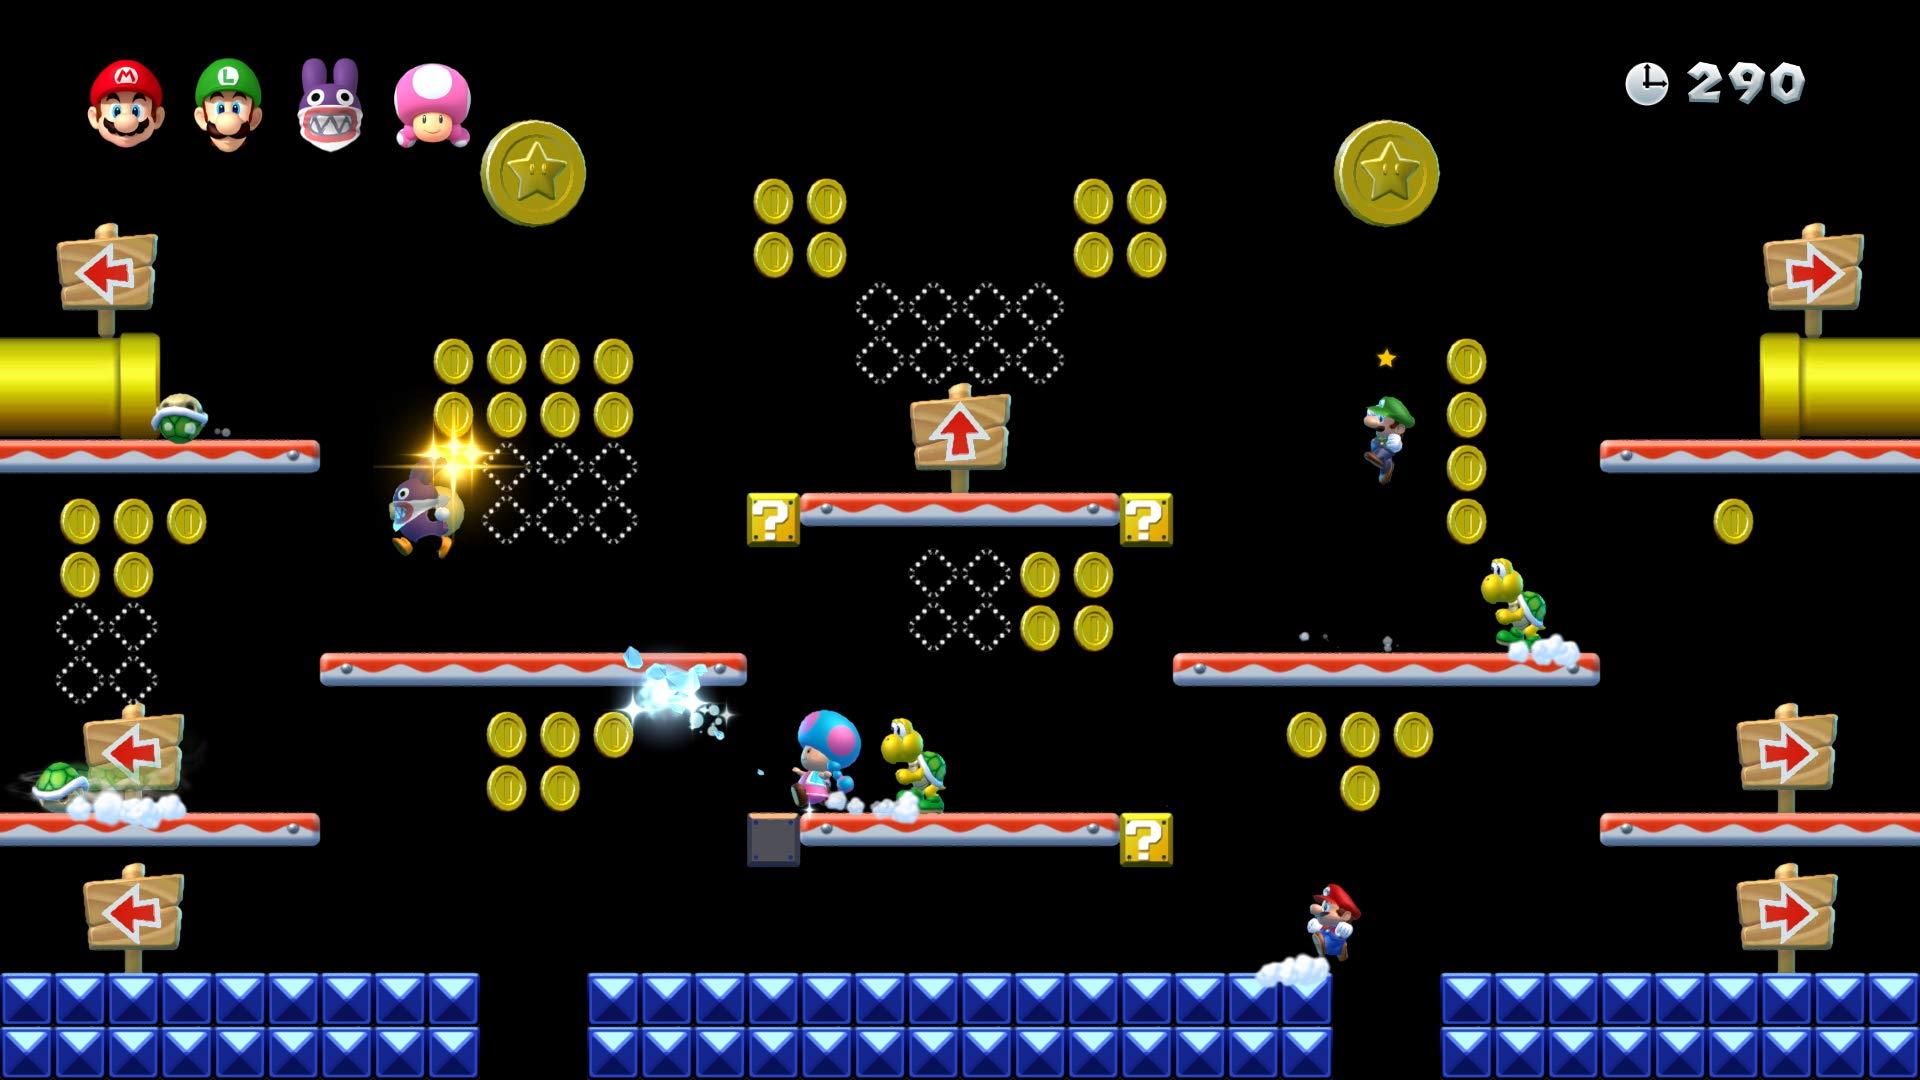 New Super Mario Bros. U Deluxe - Nintendo Switch  Mario Kart 8 Deluxe - Nintendo Switch  The Legend of Zelda: Breath of the Wild (Nintendo Switch)  Super Mario Odyssey - Nintendo Switch  Super Mario Party  LEGO Ninjago Movie Game: Videogame (Nintendo Switch)